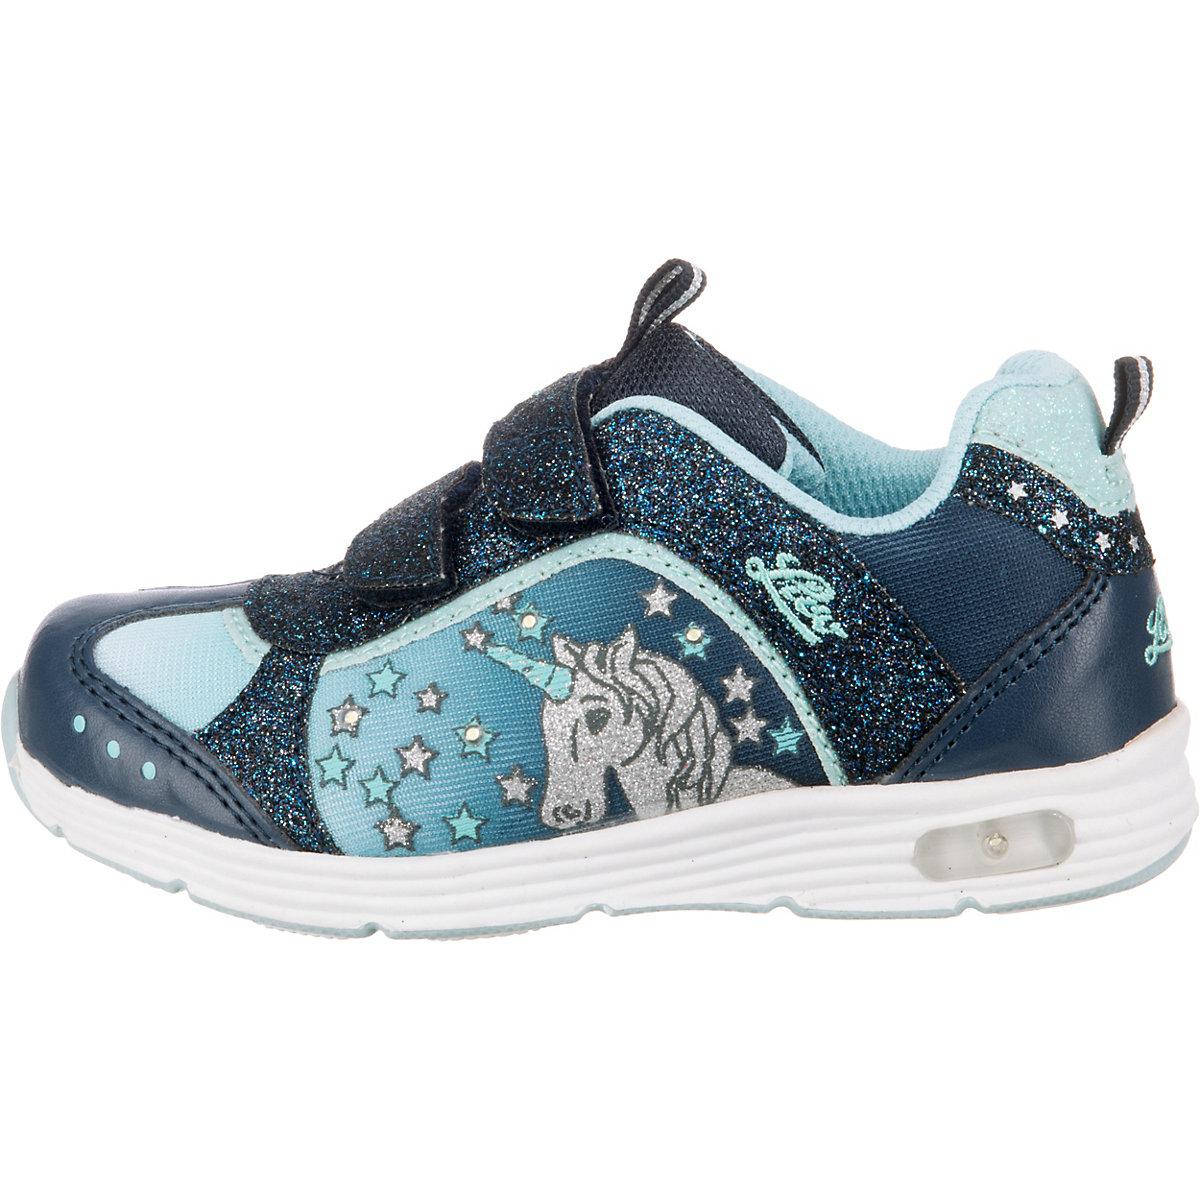 Lico, Sneakers Low Unicorn V Blinky Für Mädchen, Dunkelblau